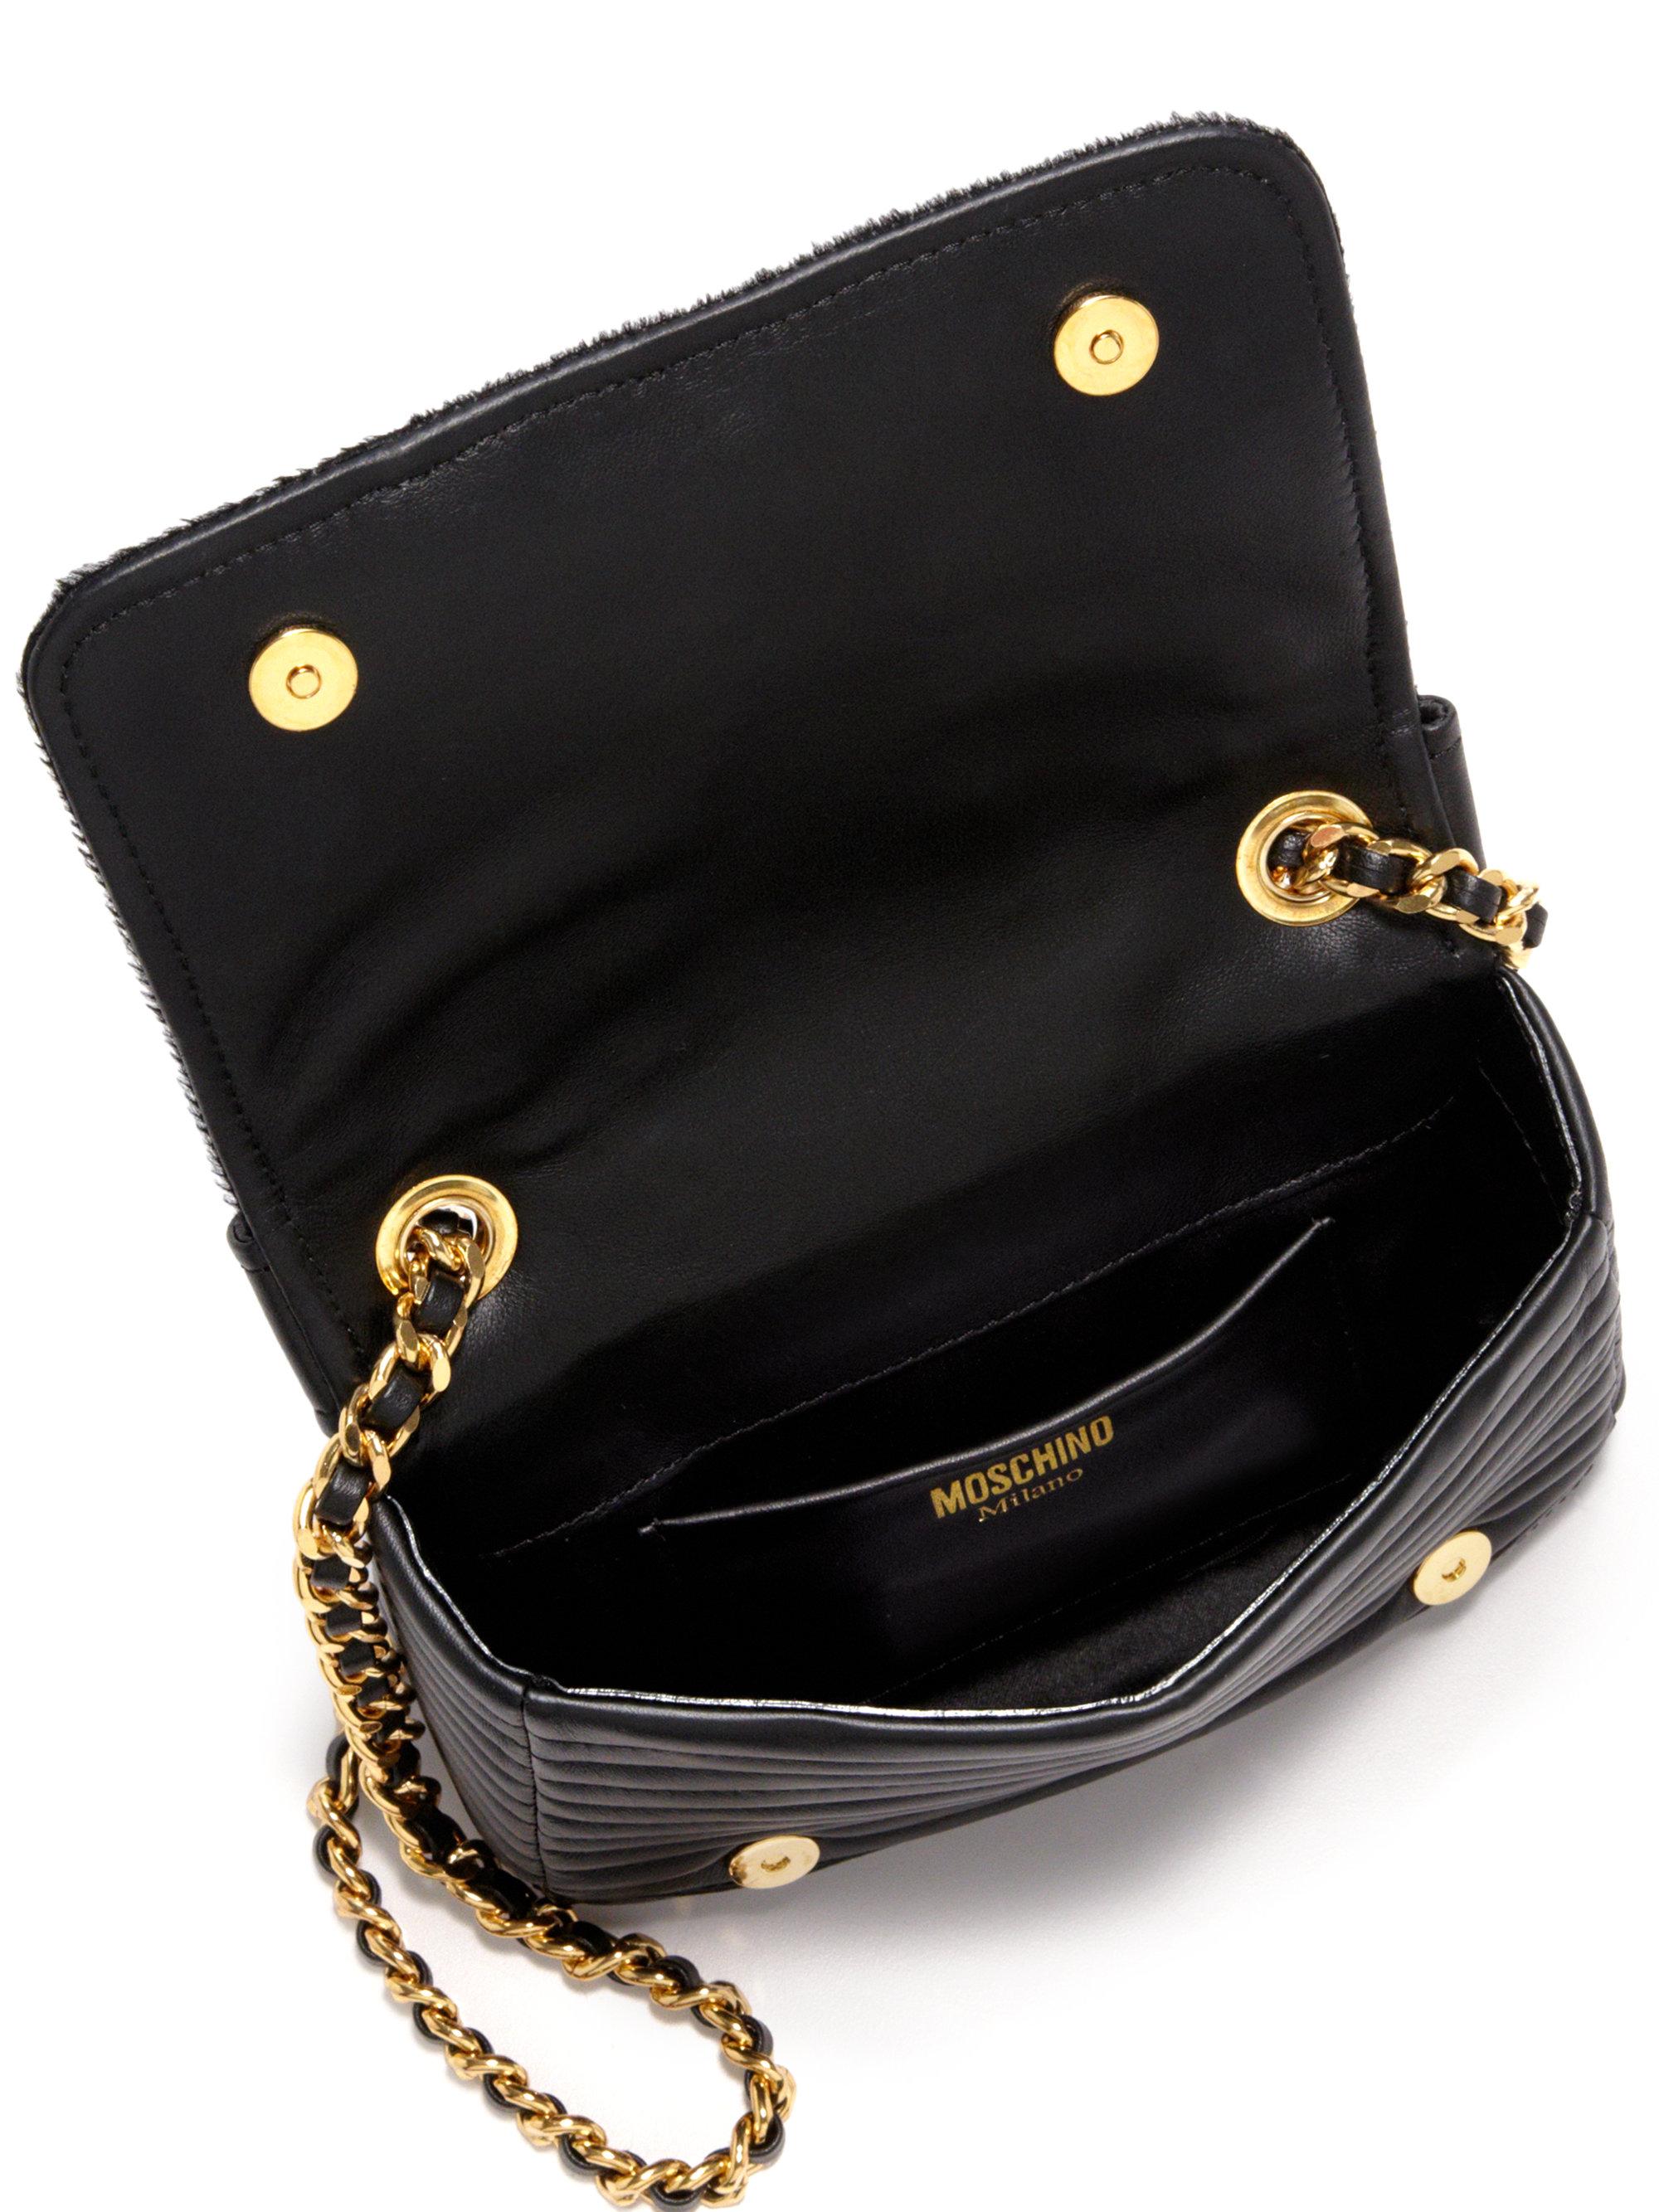 Moschino moto shoulder bag - Black WkxCq